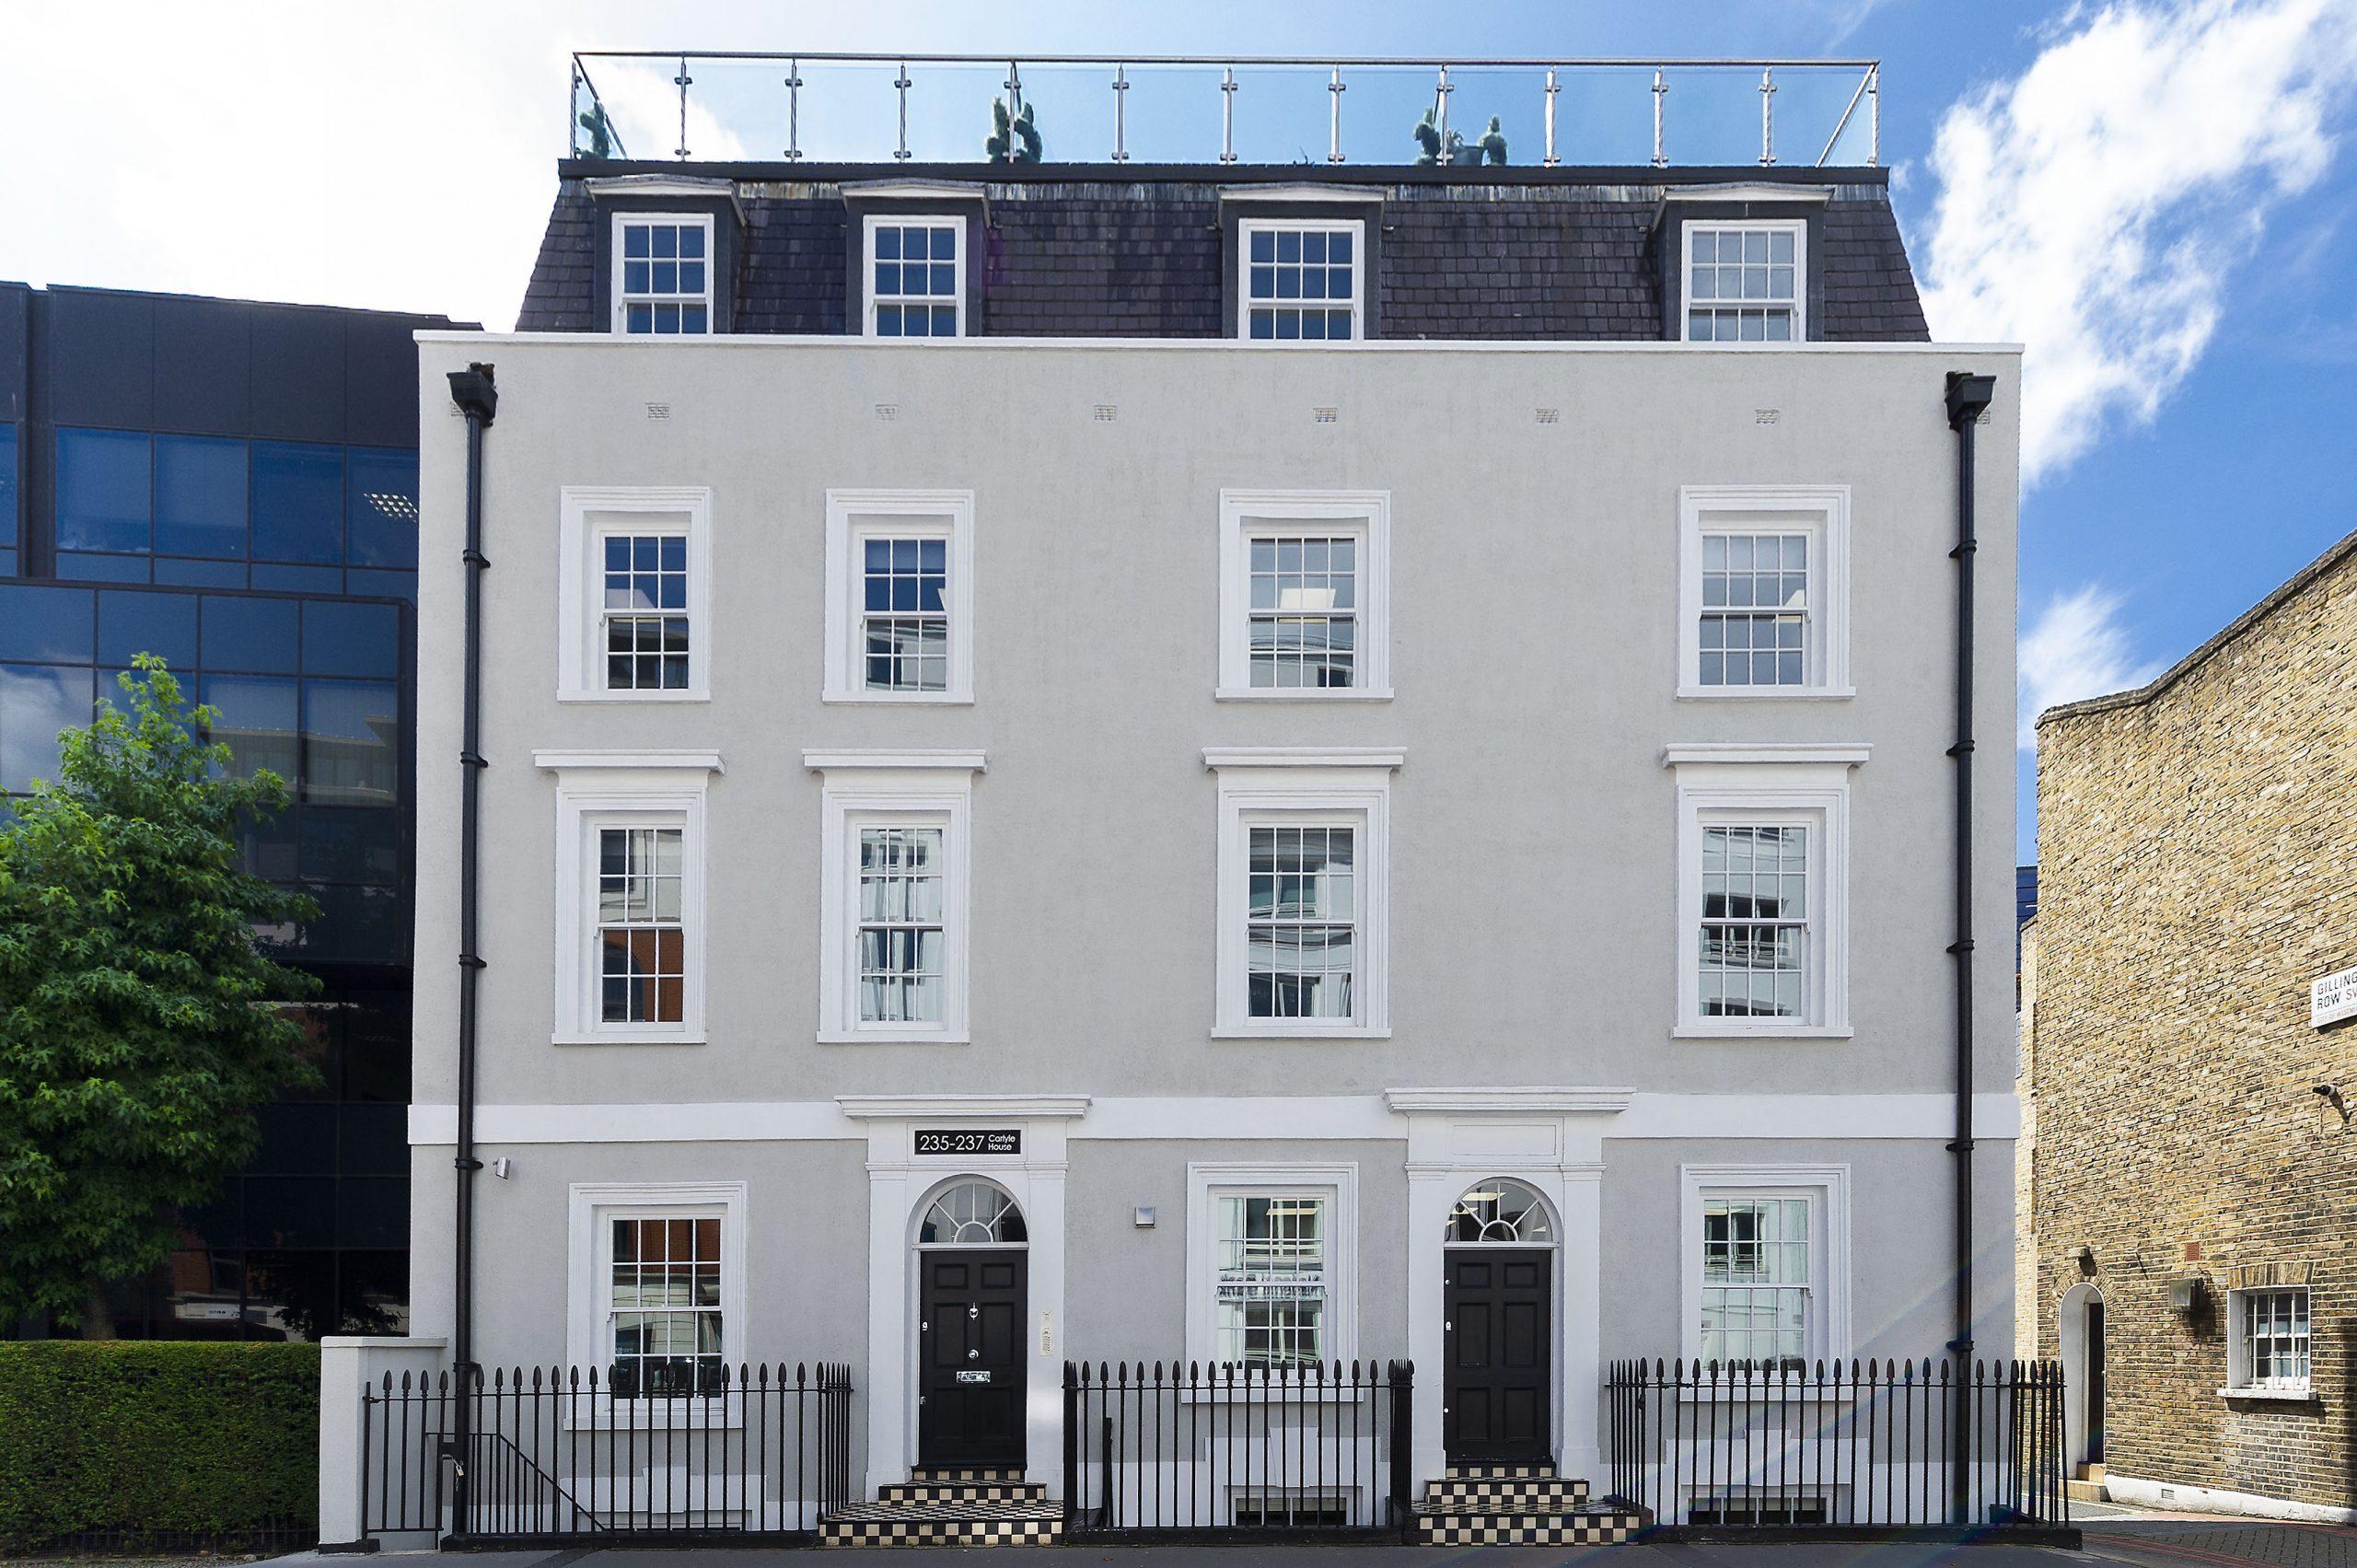 Carlyle House, 235-237 Vauxhall Bridge Road, London, SW1V 1EJ